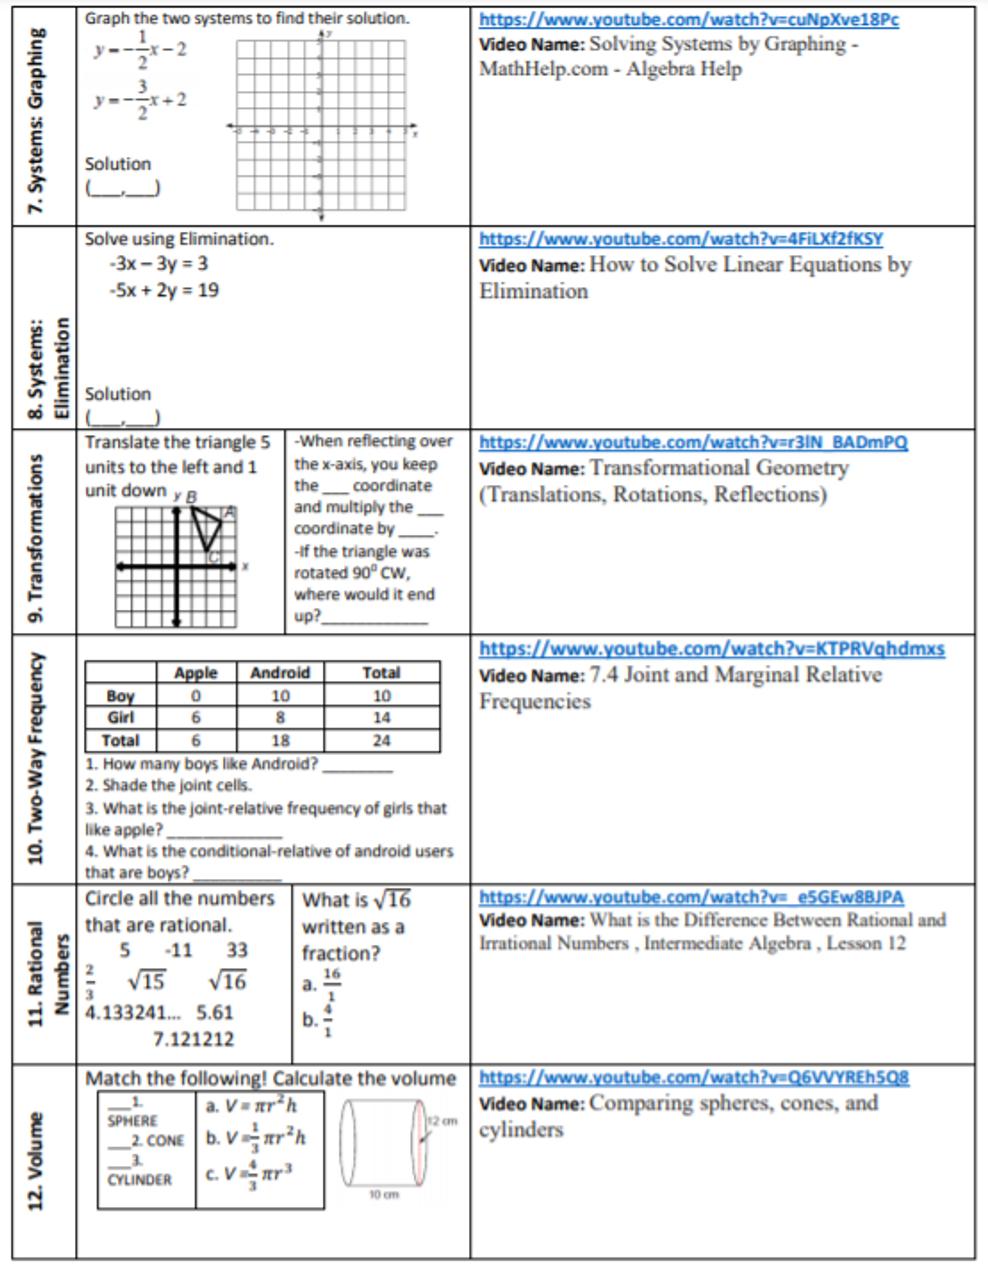 Math 8 Cumulative Final: Study Guide + Video Links